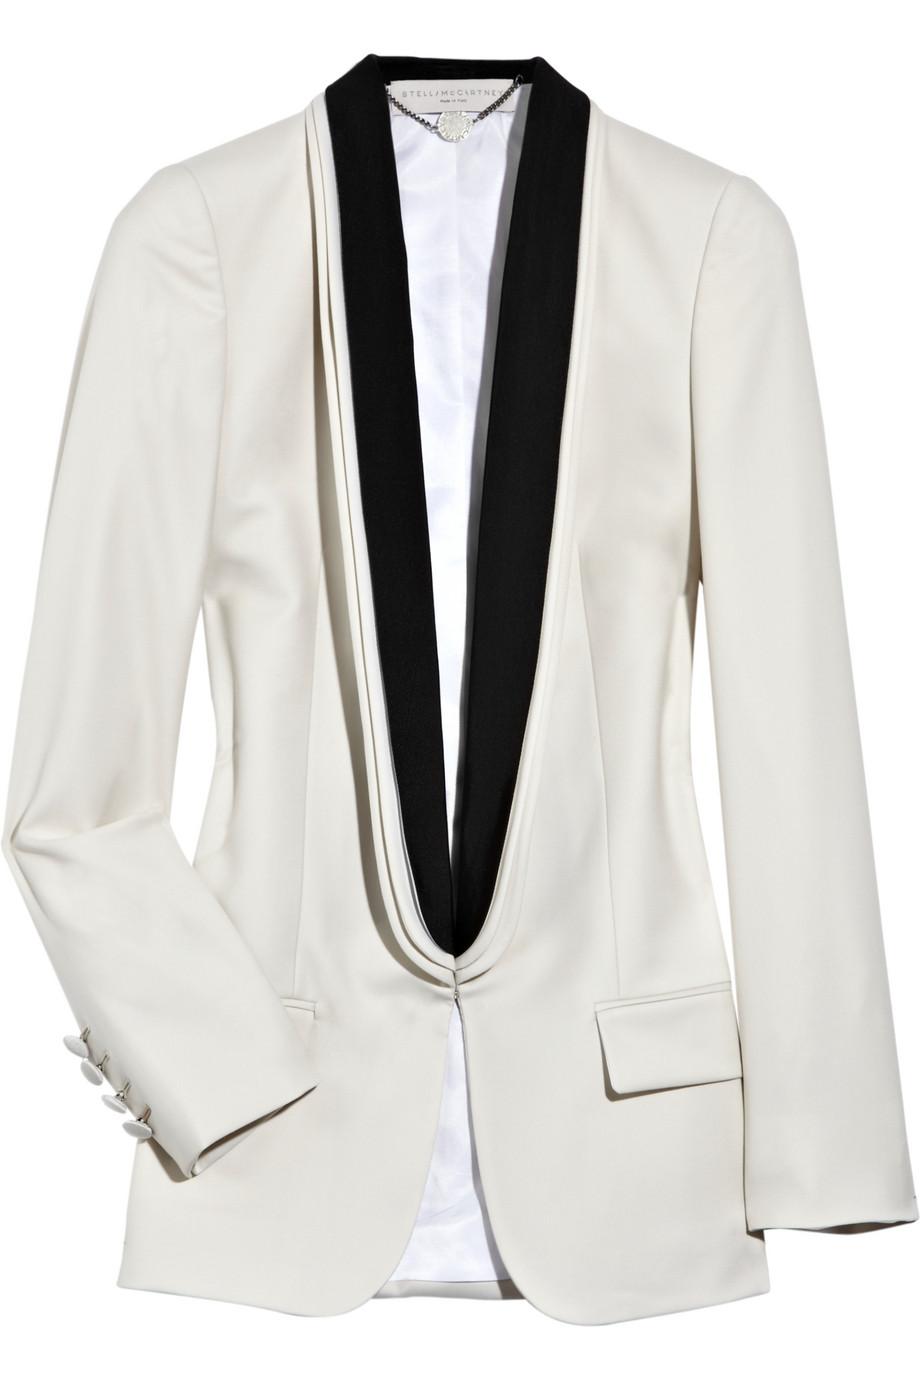 stella-mccartney-ivory-wool-twill-tuxedo-jacket-product-1-2278584-053144156.jpg